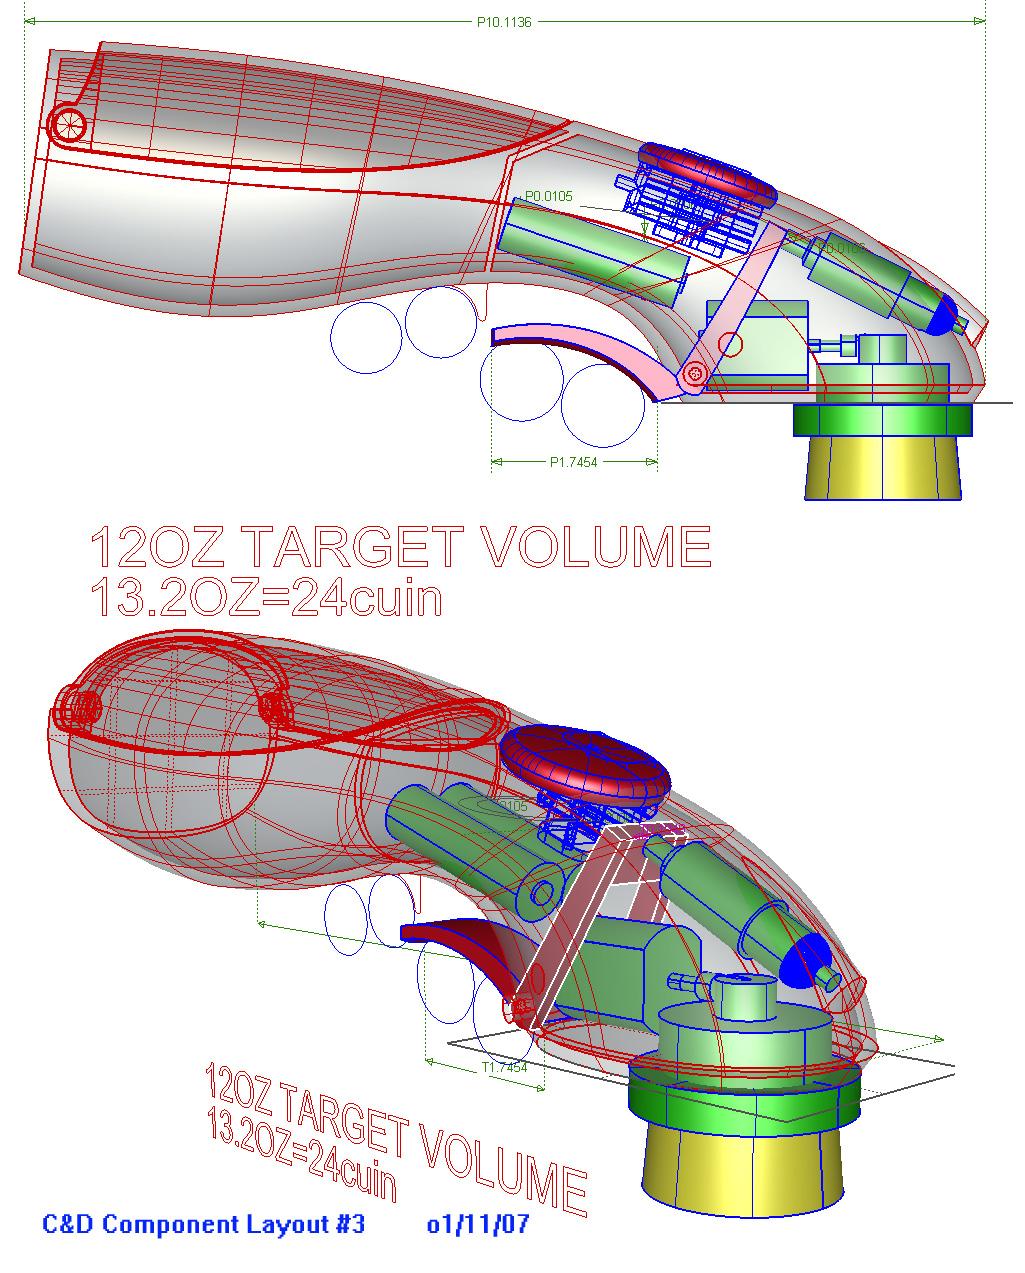 C&D_011107_layout3.jpg